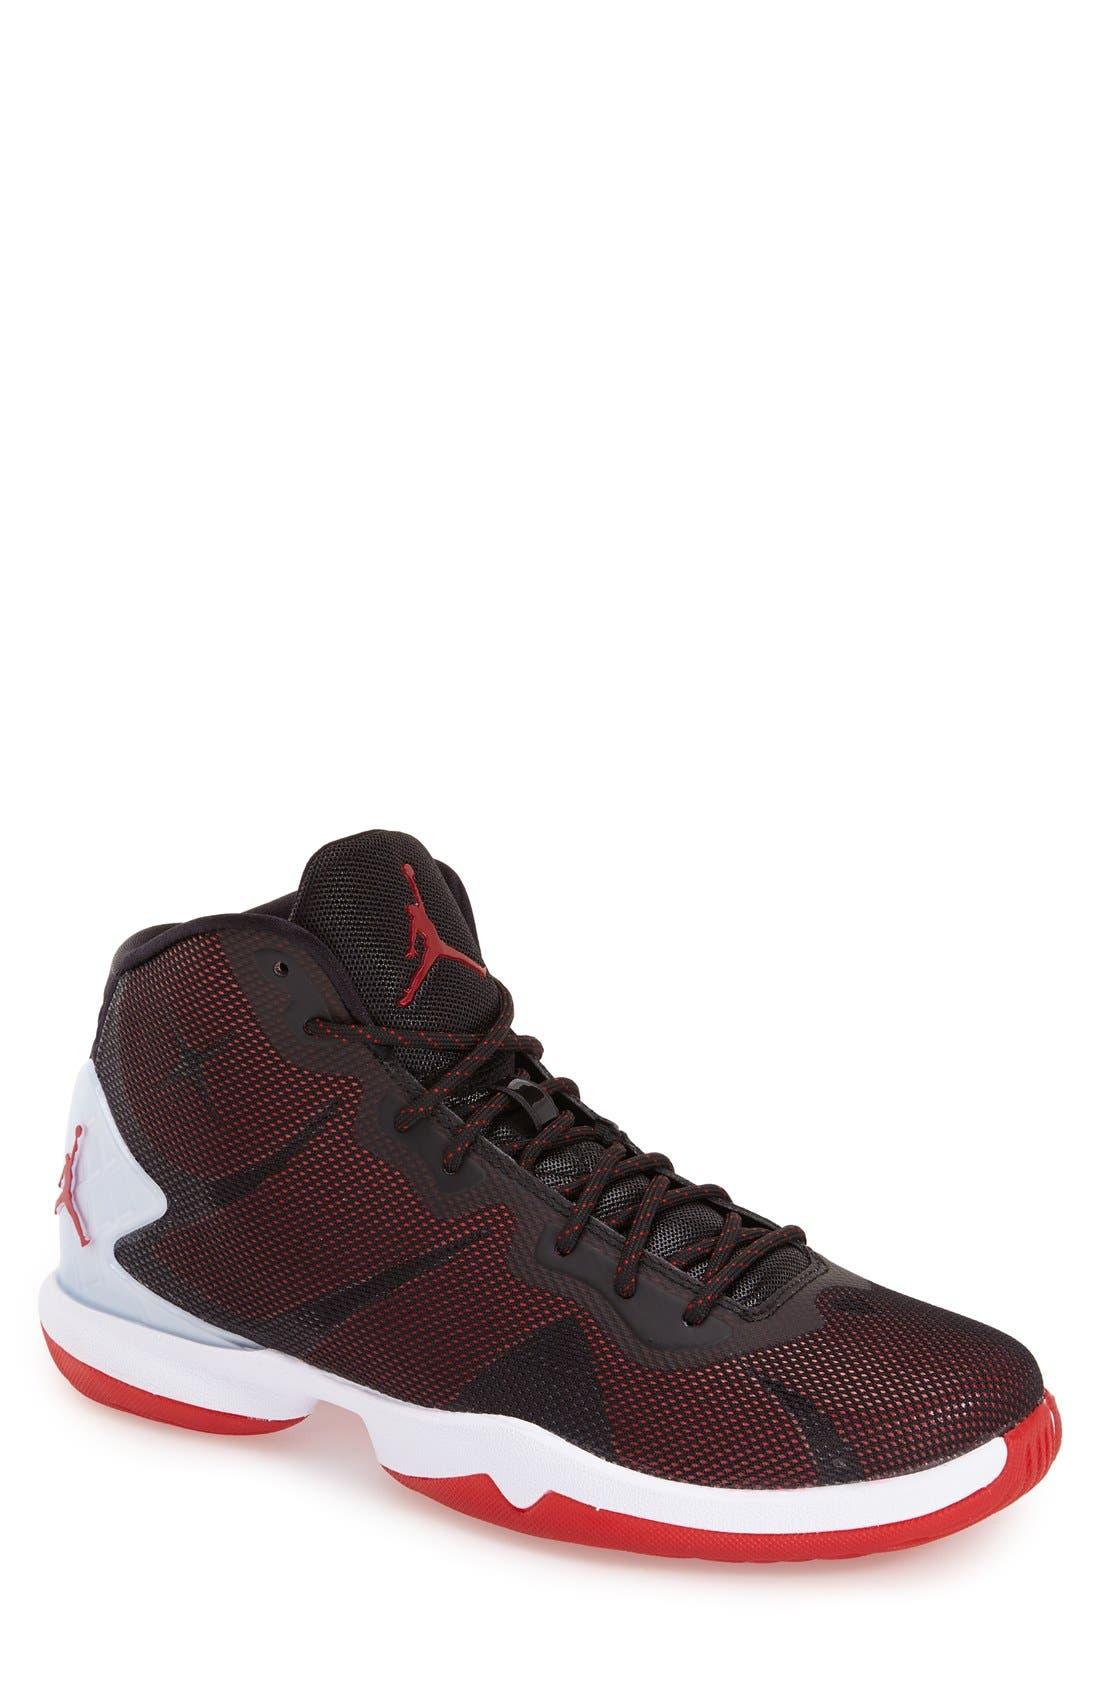 Main Image - Nike 'Jordan Super.Fly 4' Basketball Shoe (Men)